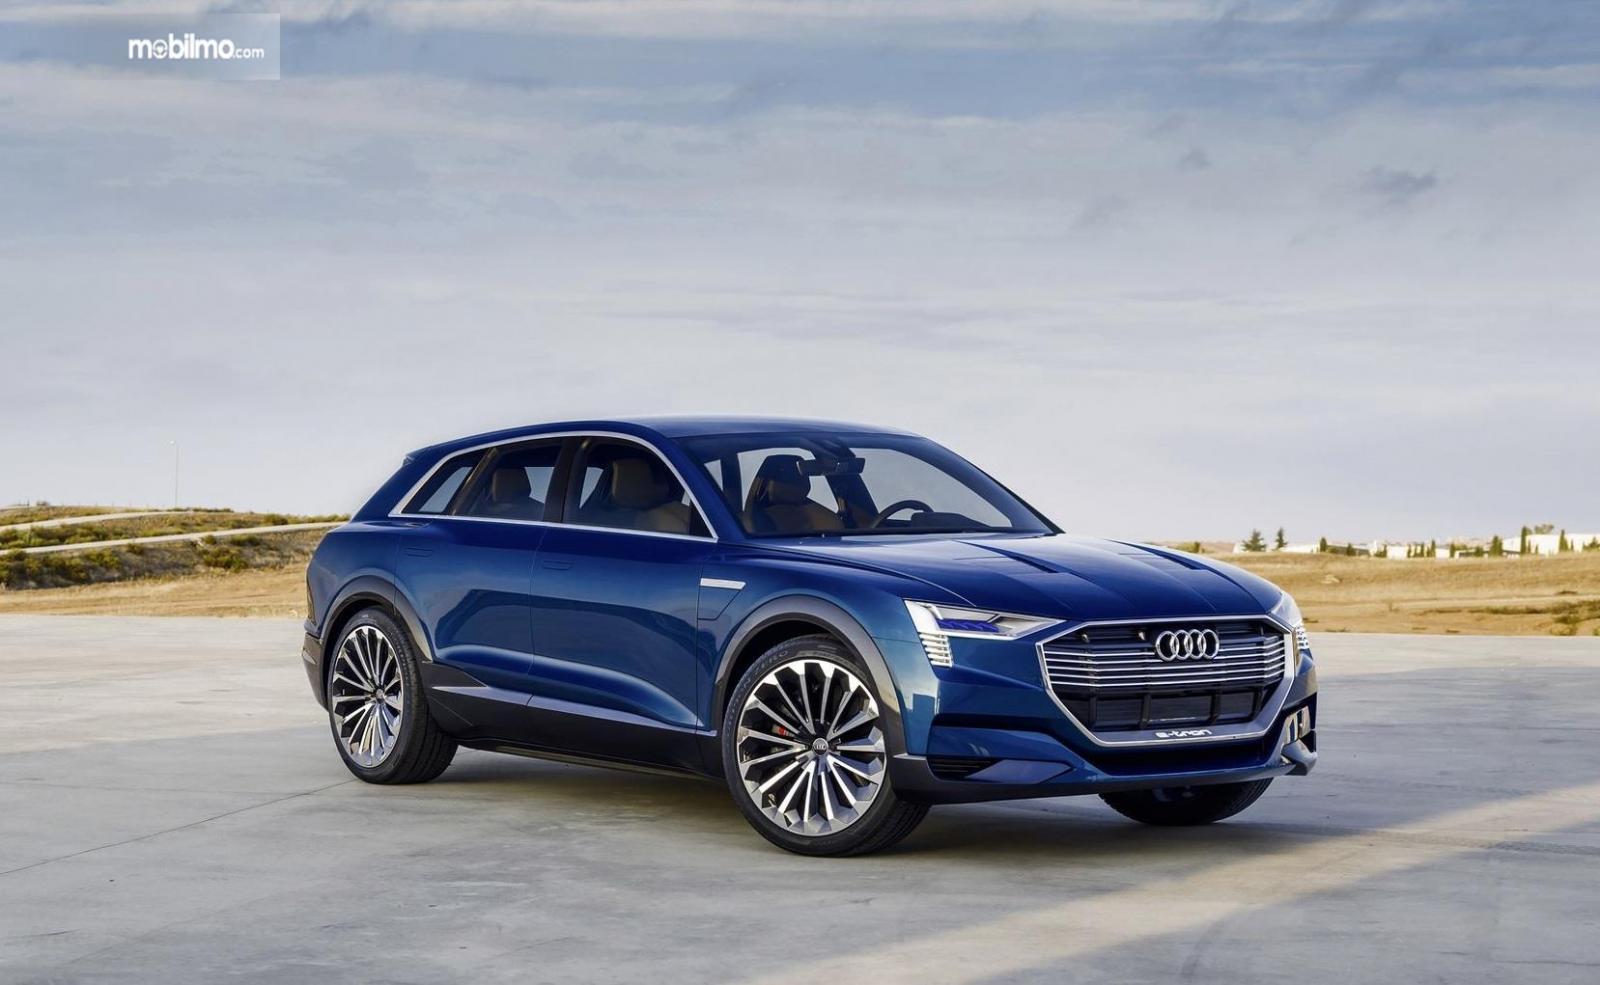 SUV Audi e-Tron berwarna biru